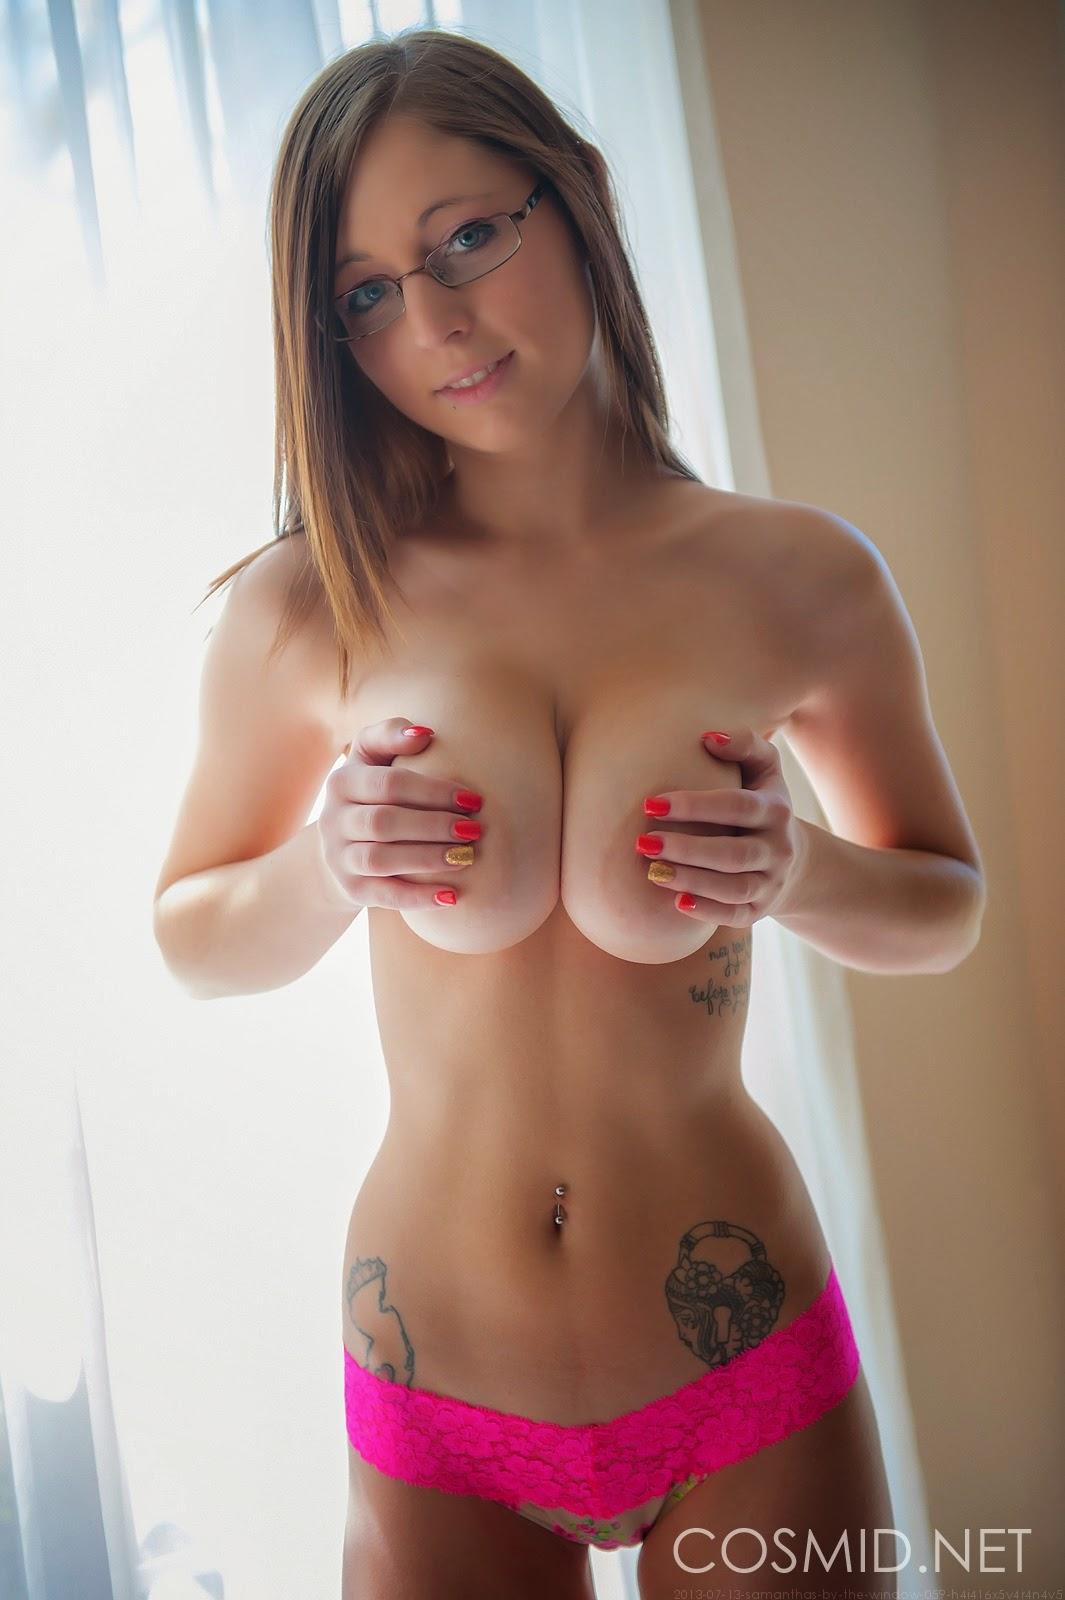 Nerd girls tits